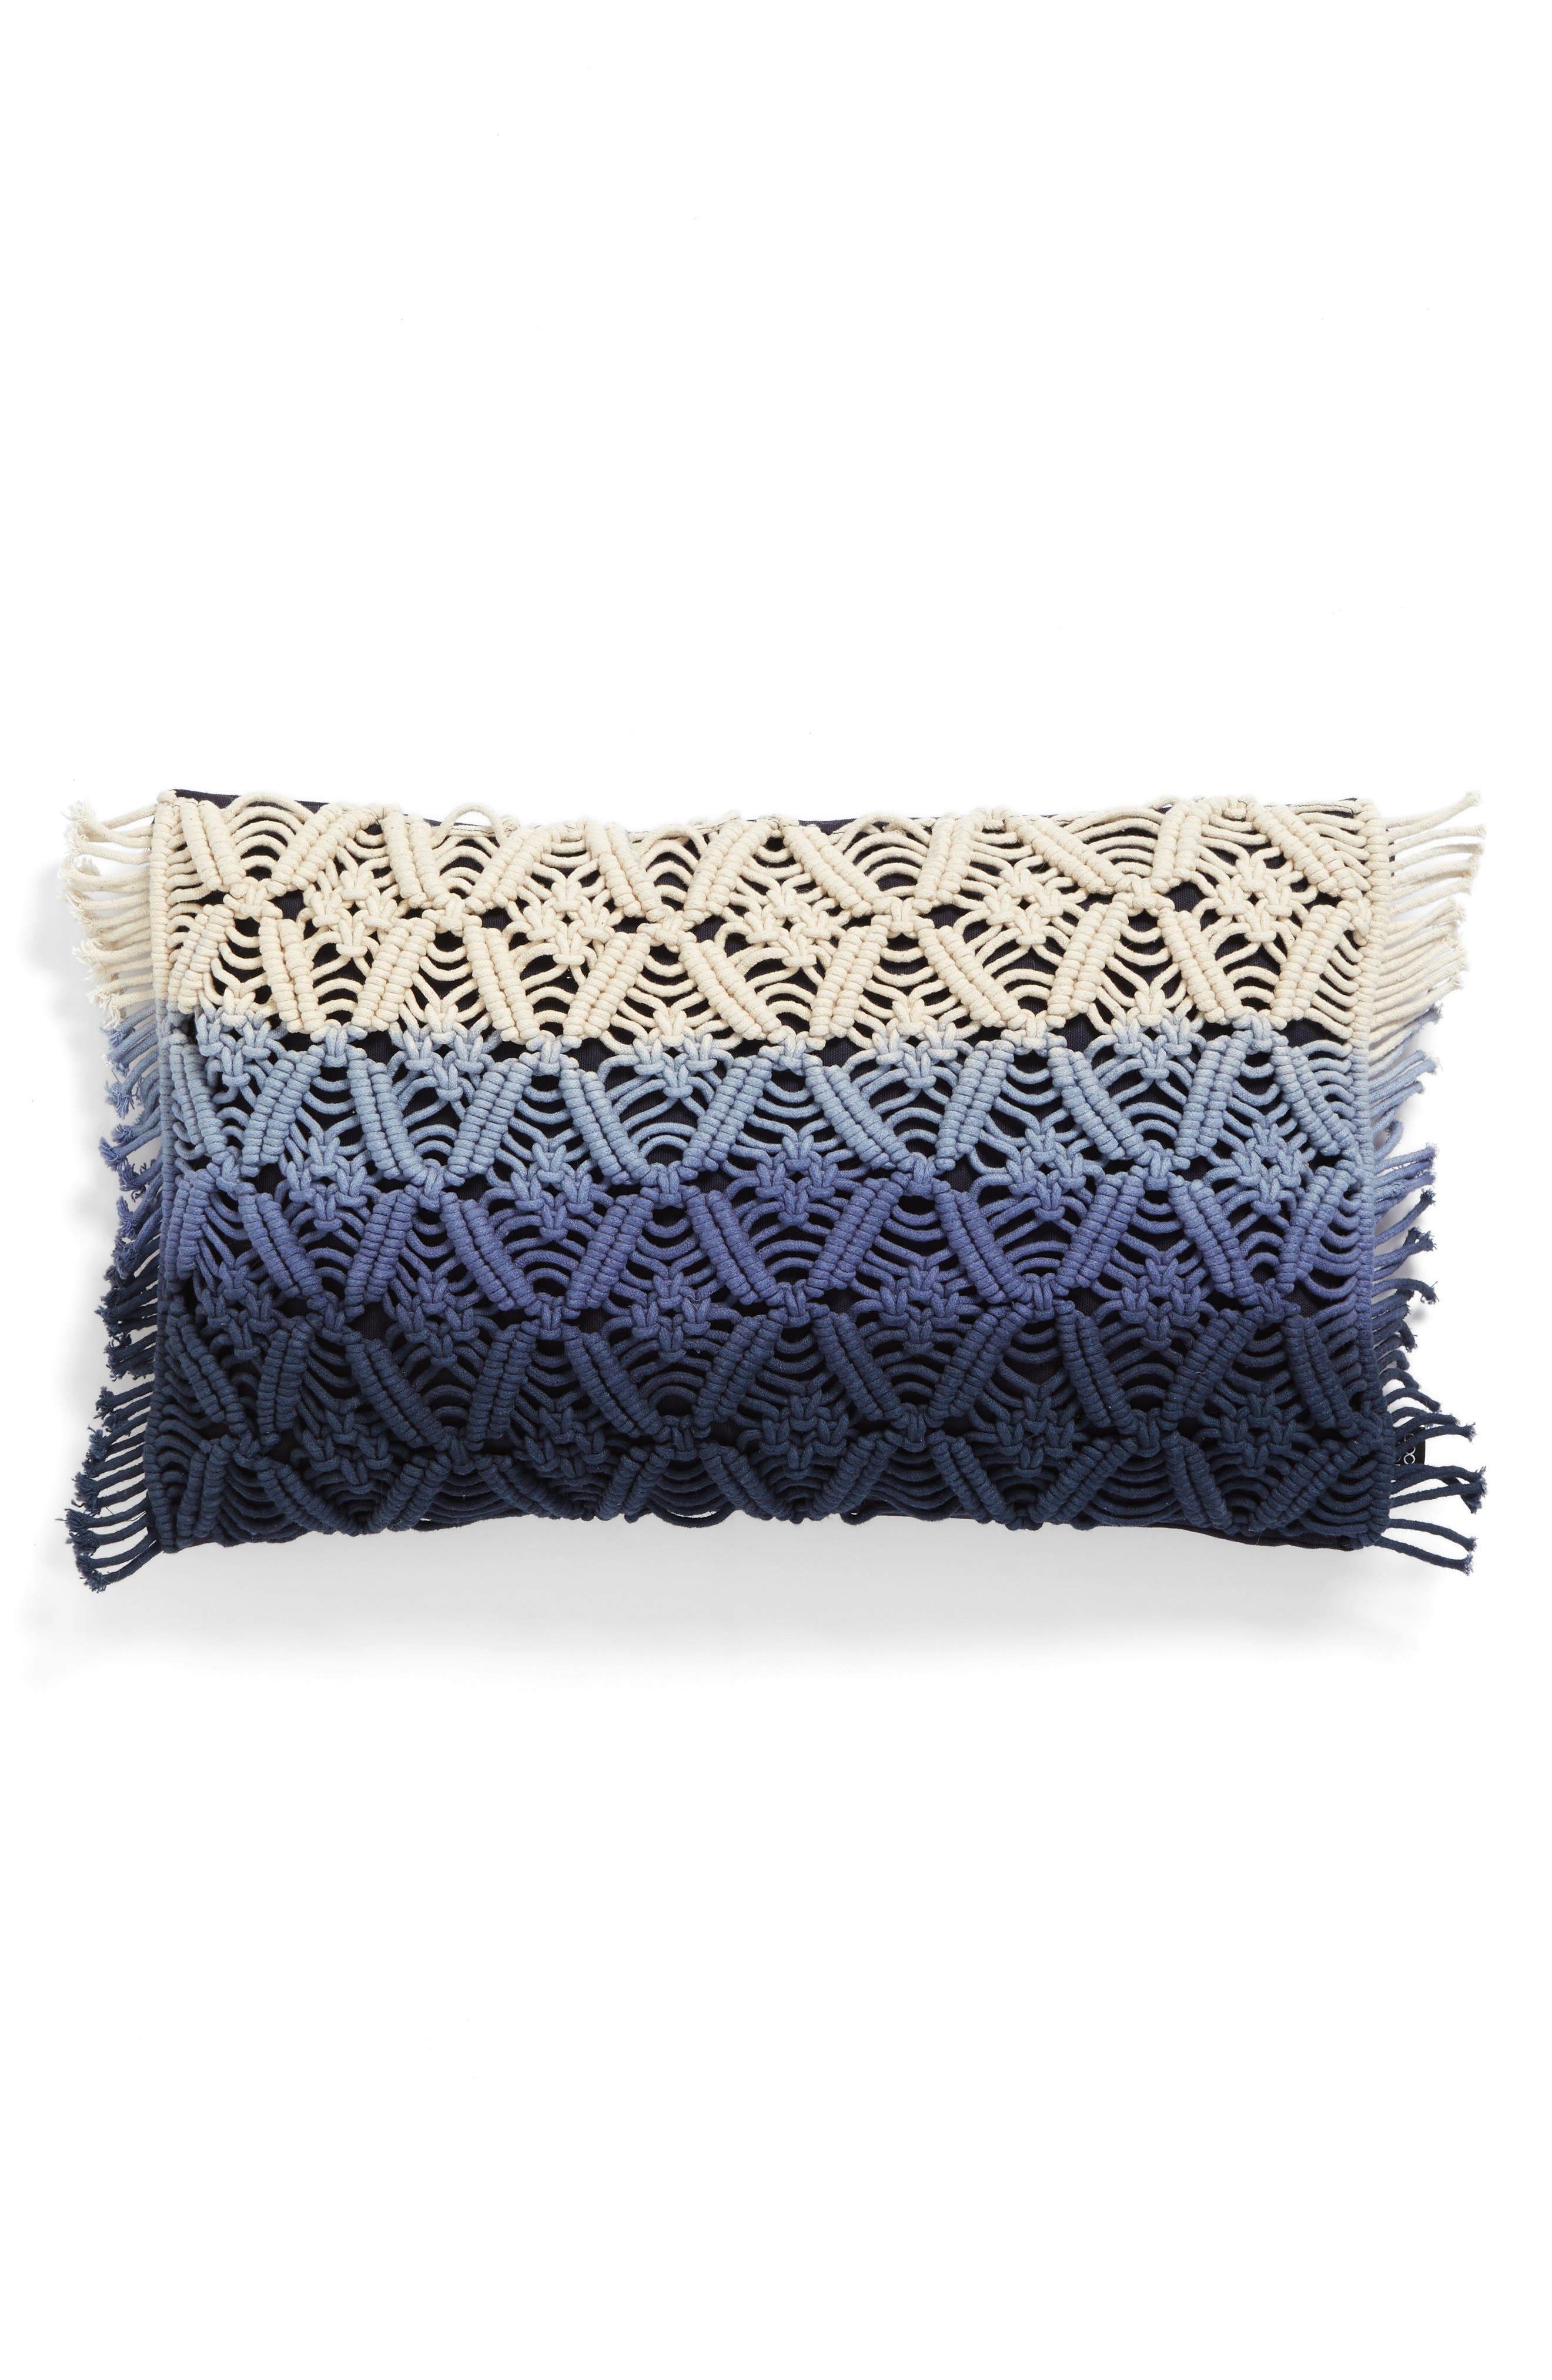 Main Image - Eightmood Dip Dye Pillow